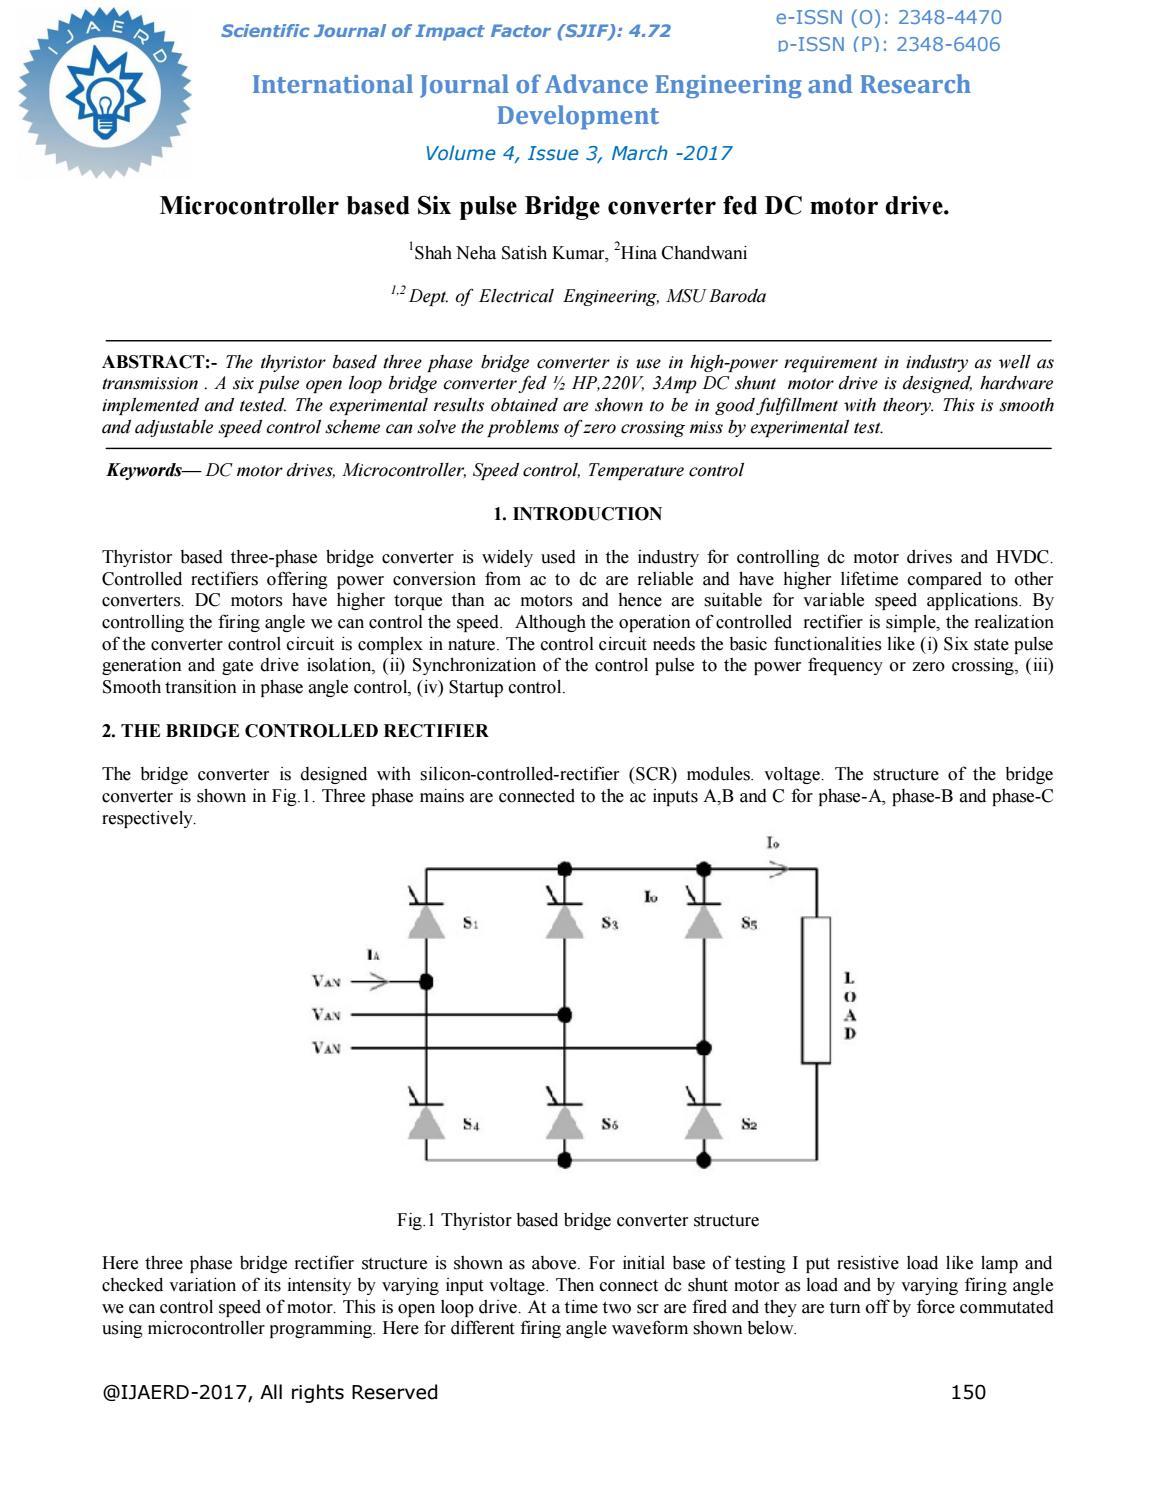 Microcontroller Based Six Pulse Bridge Converter Fed Dc Motor Drive Scr Silicon Controlled Rectifier Ijaerdv04i0315733 By Editor Ijaerd Issuu